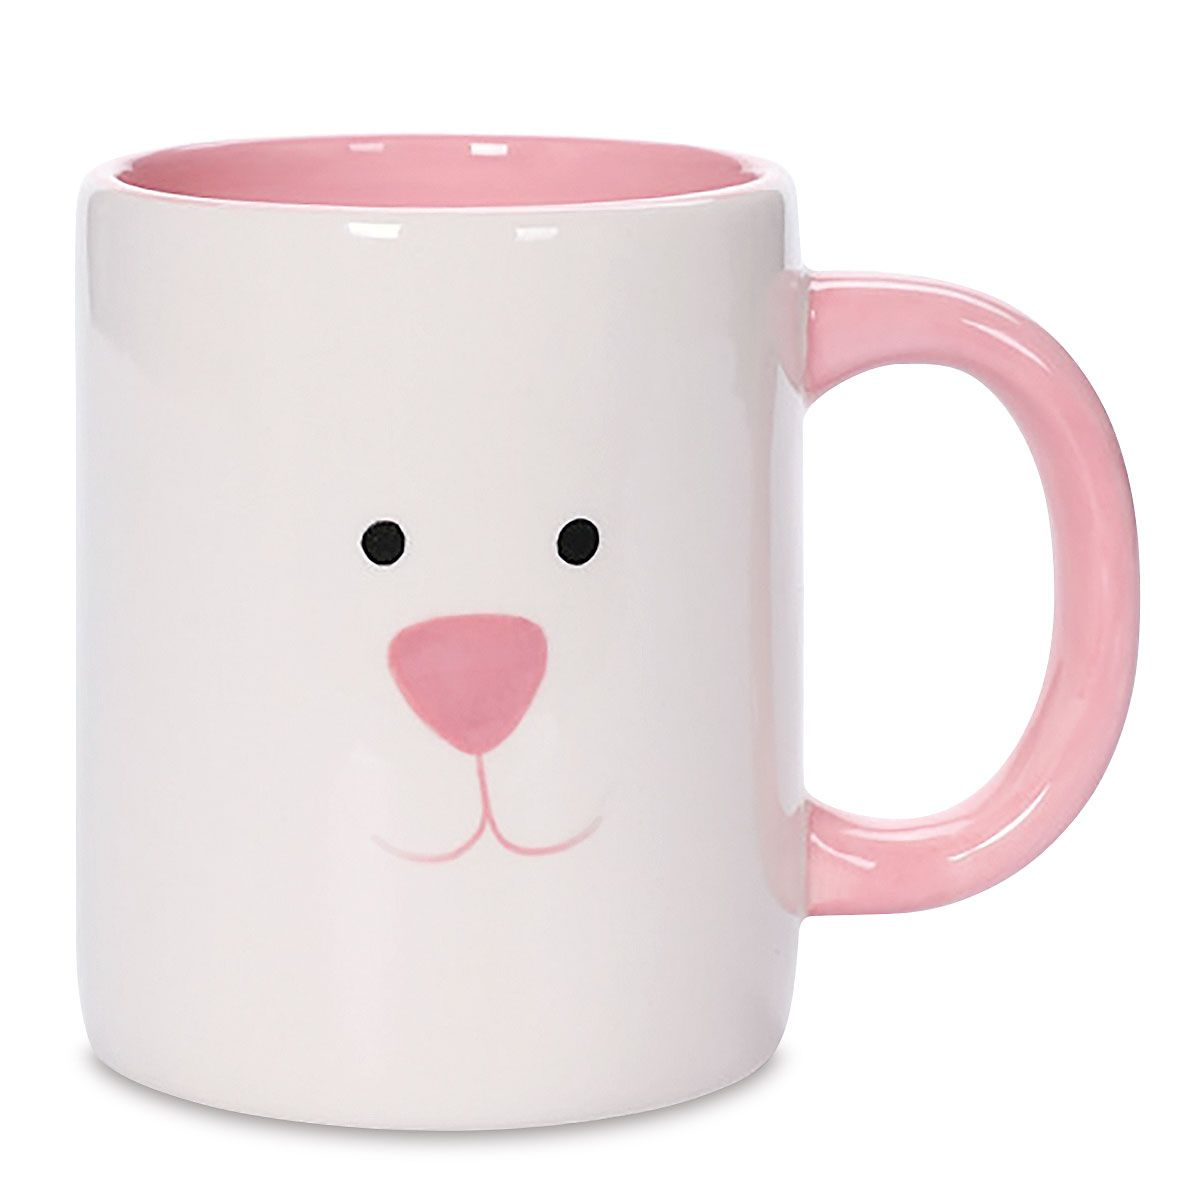 Mug Bunny Face